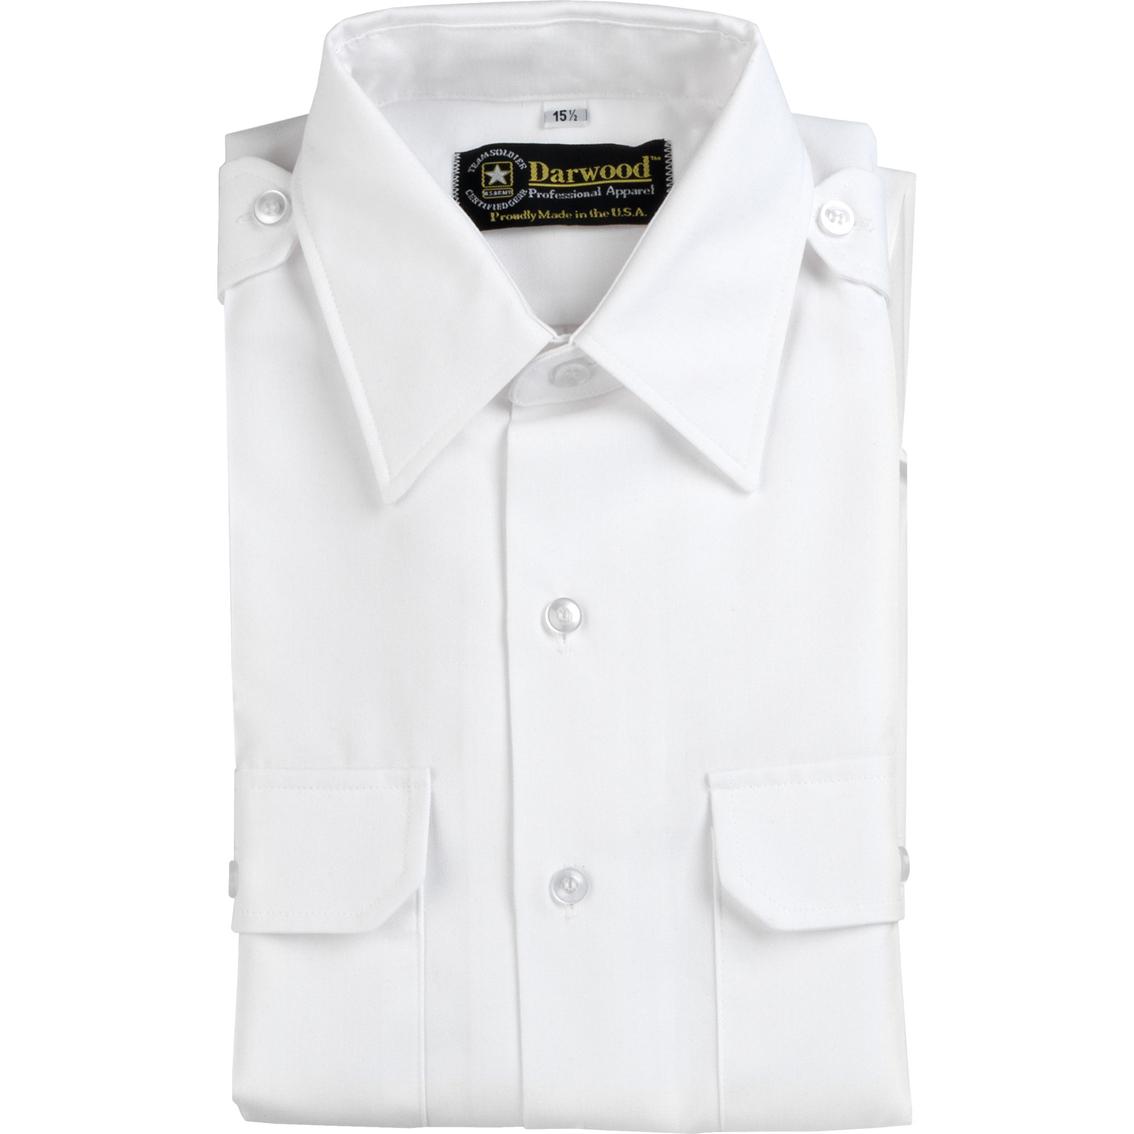 Darwood Short Sleeve Tapered Shirt White Asu Shirts Military